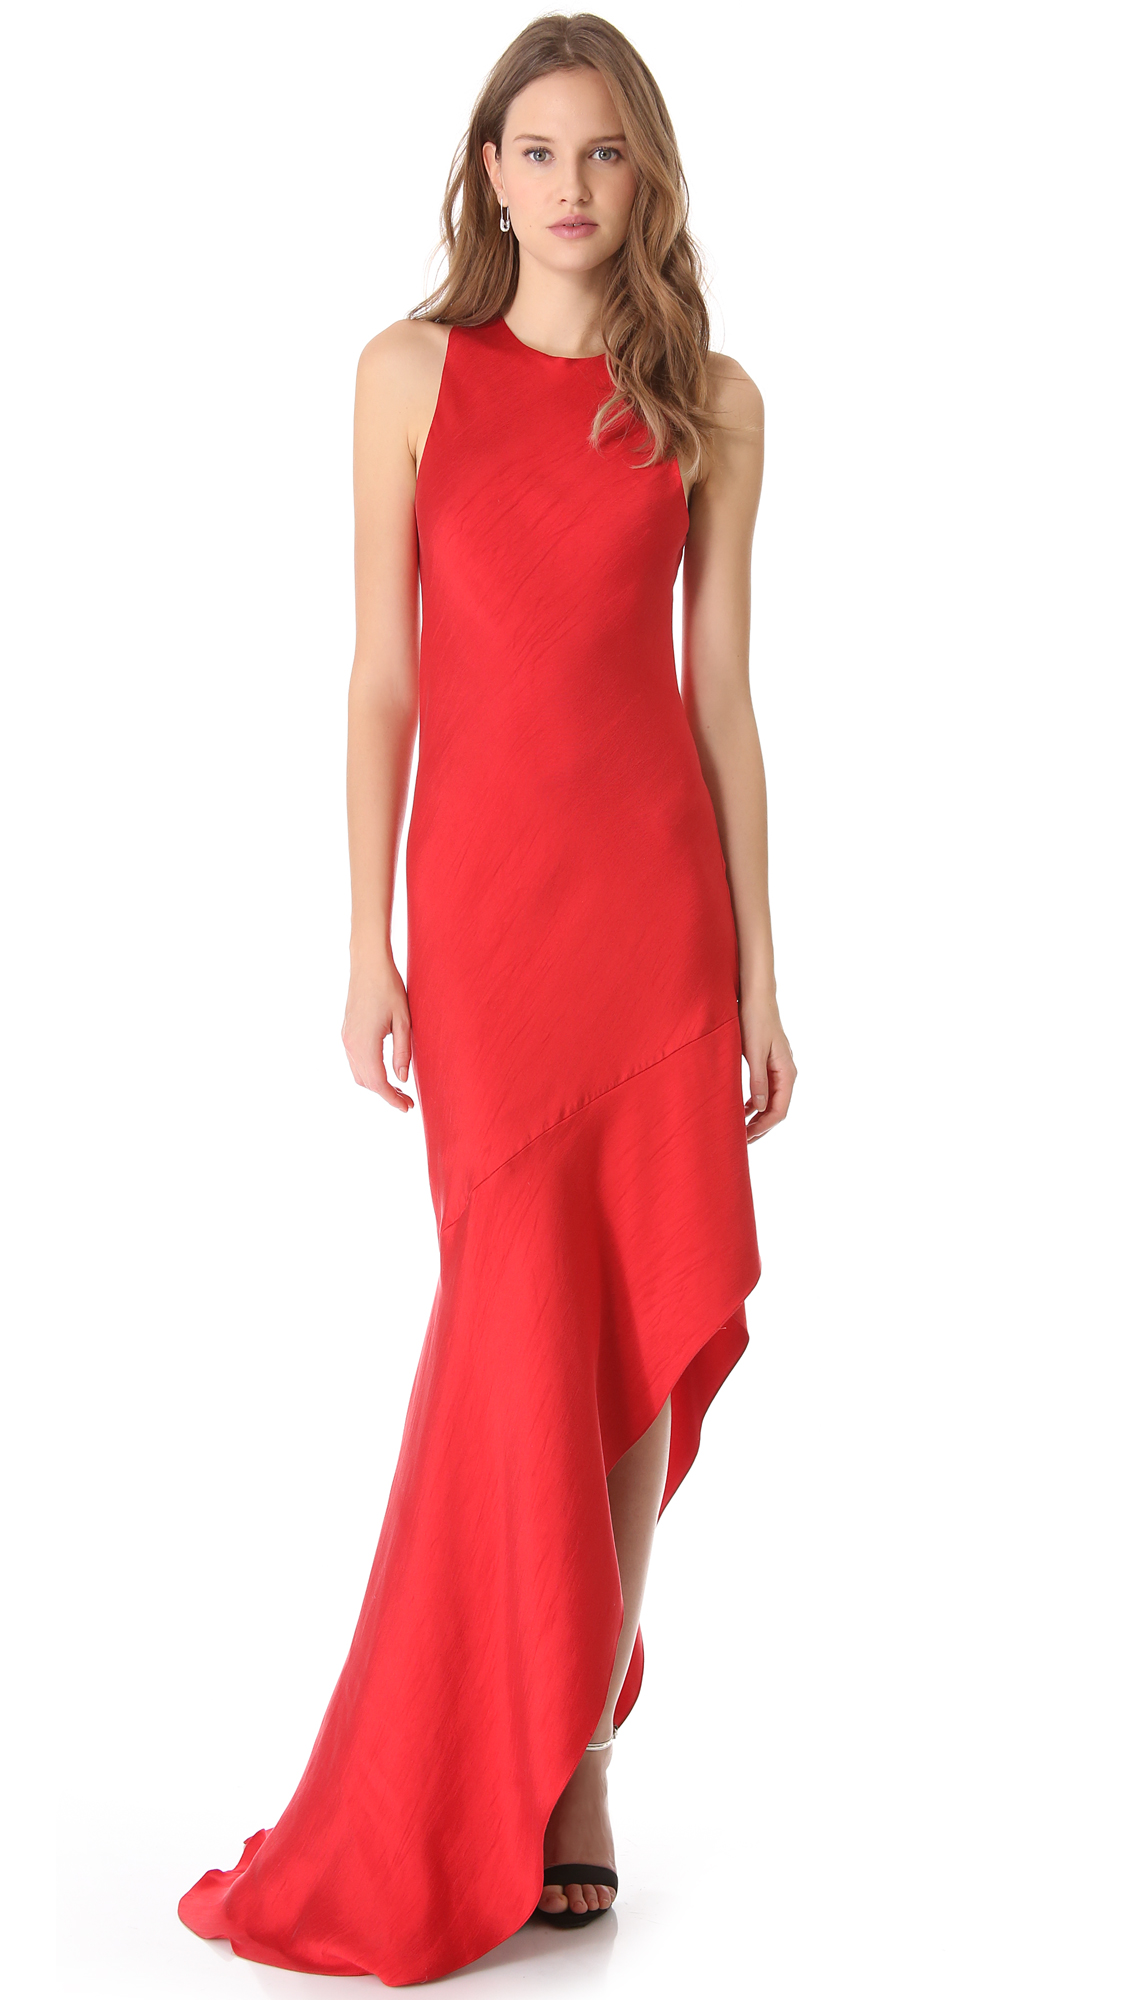 Wes Gordon Asymmetrical Bias Dress In Red Lyst